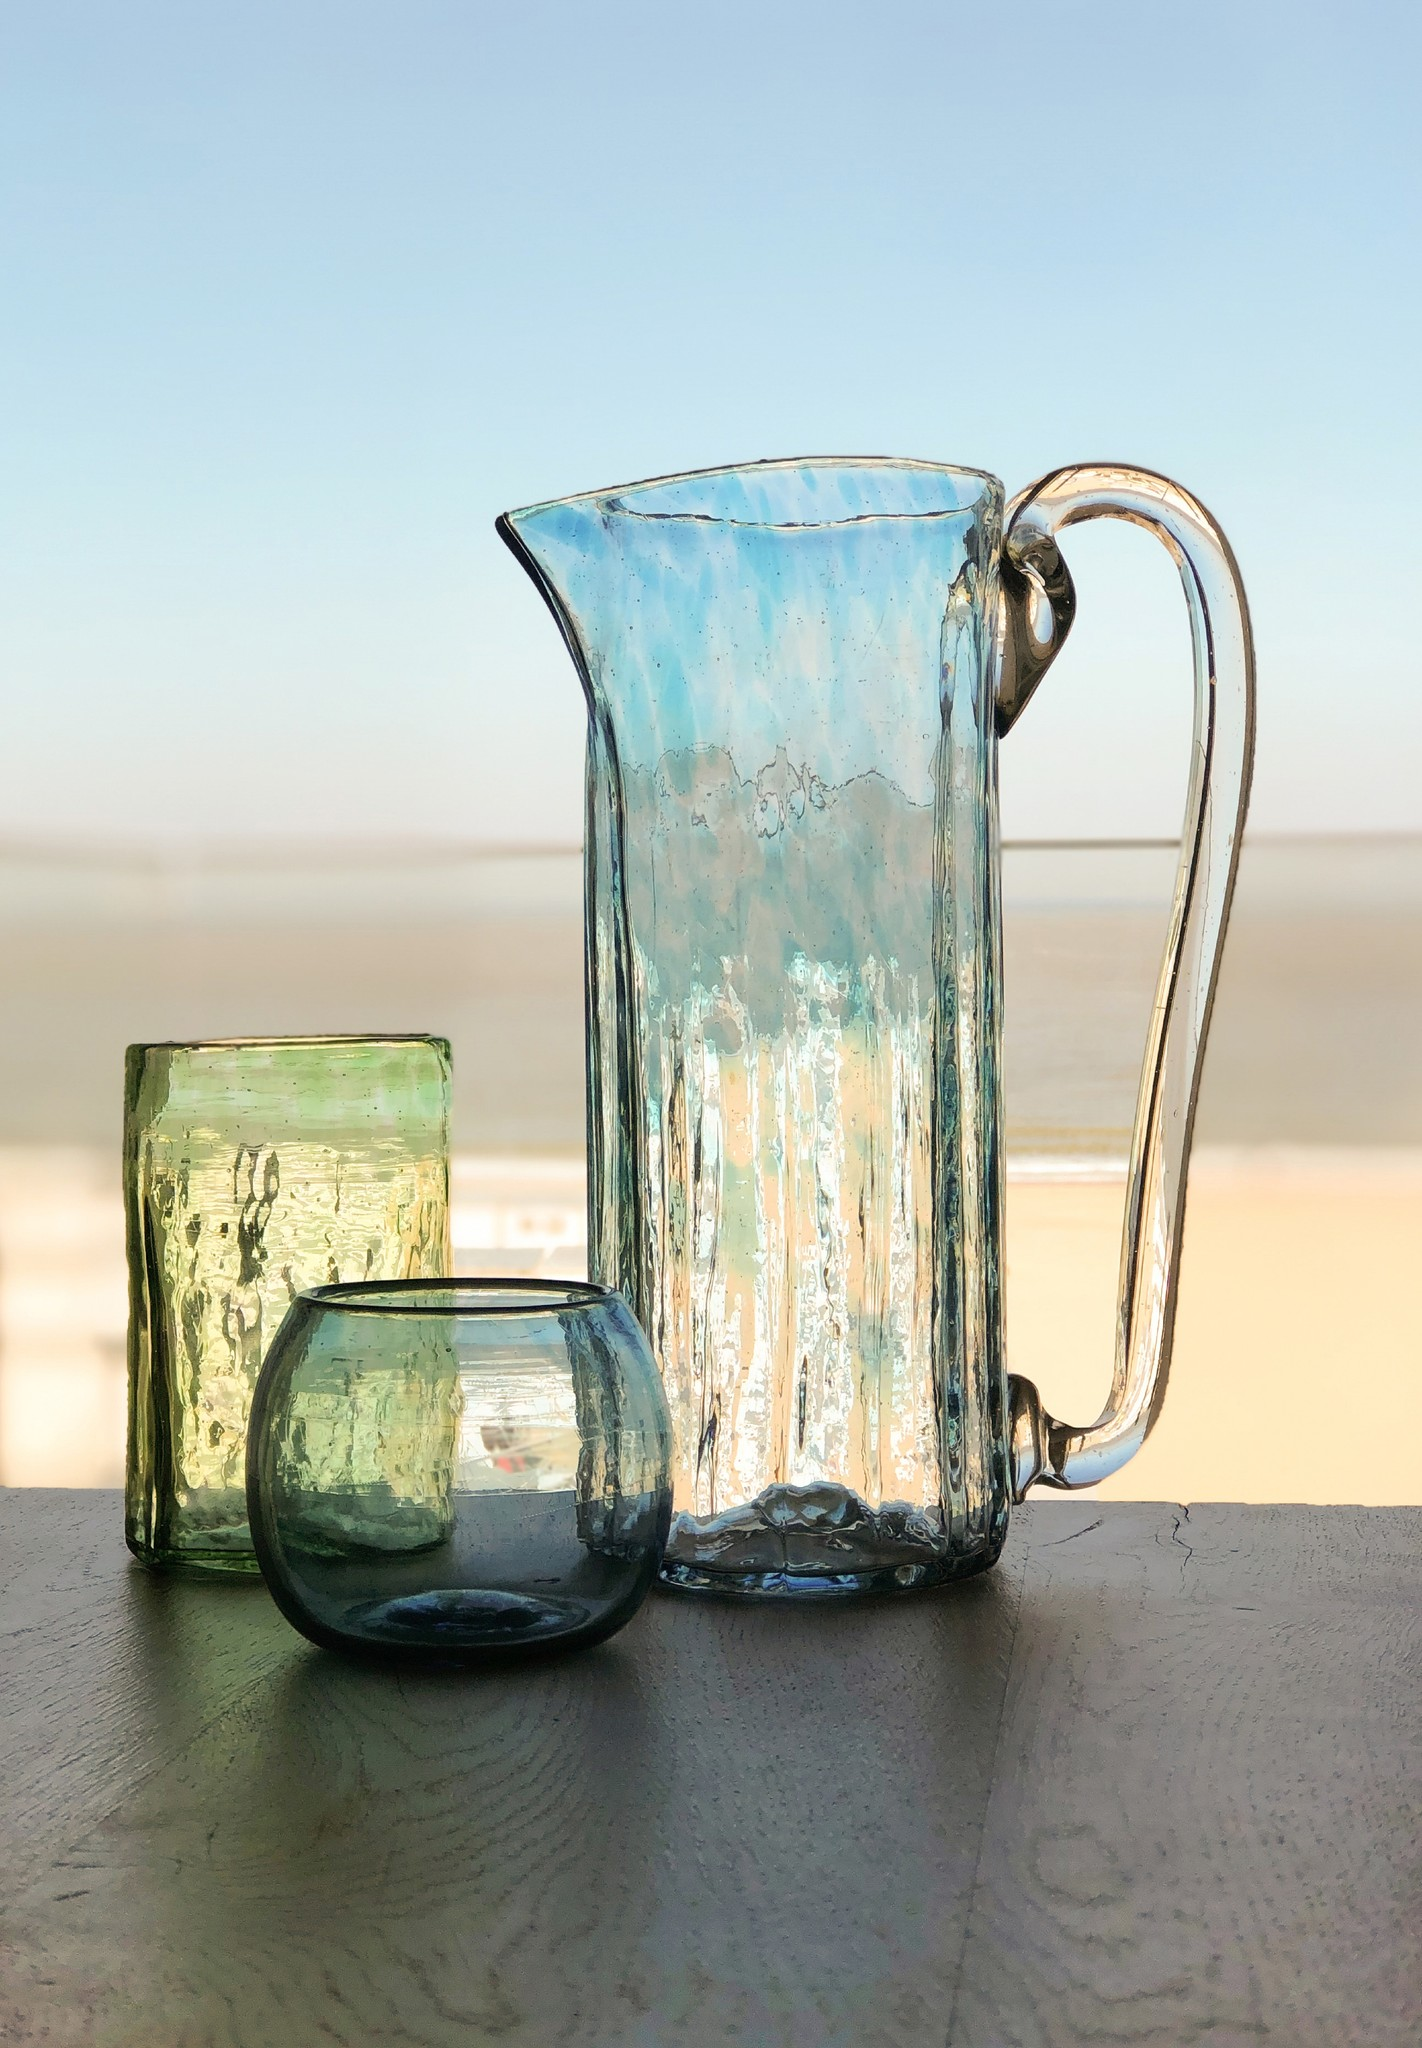 Hand-blown glass jug